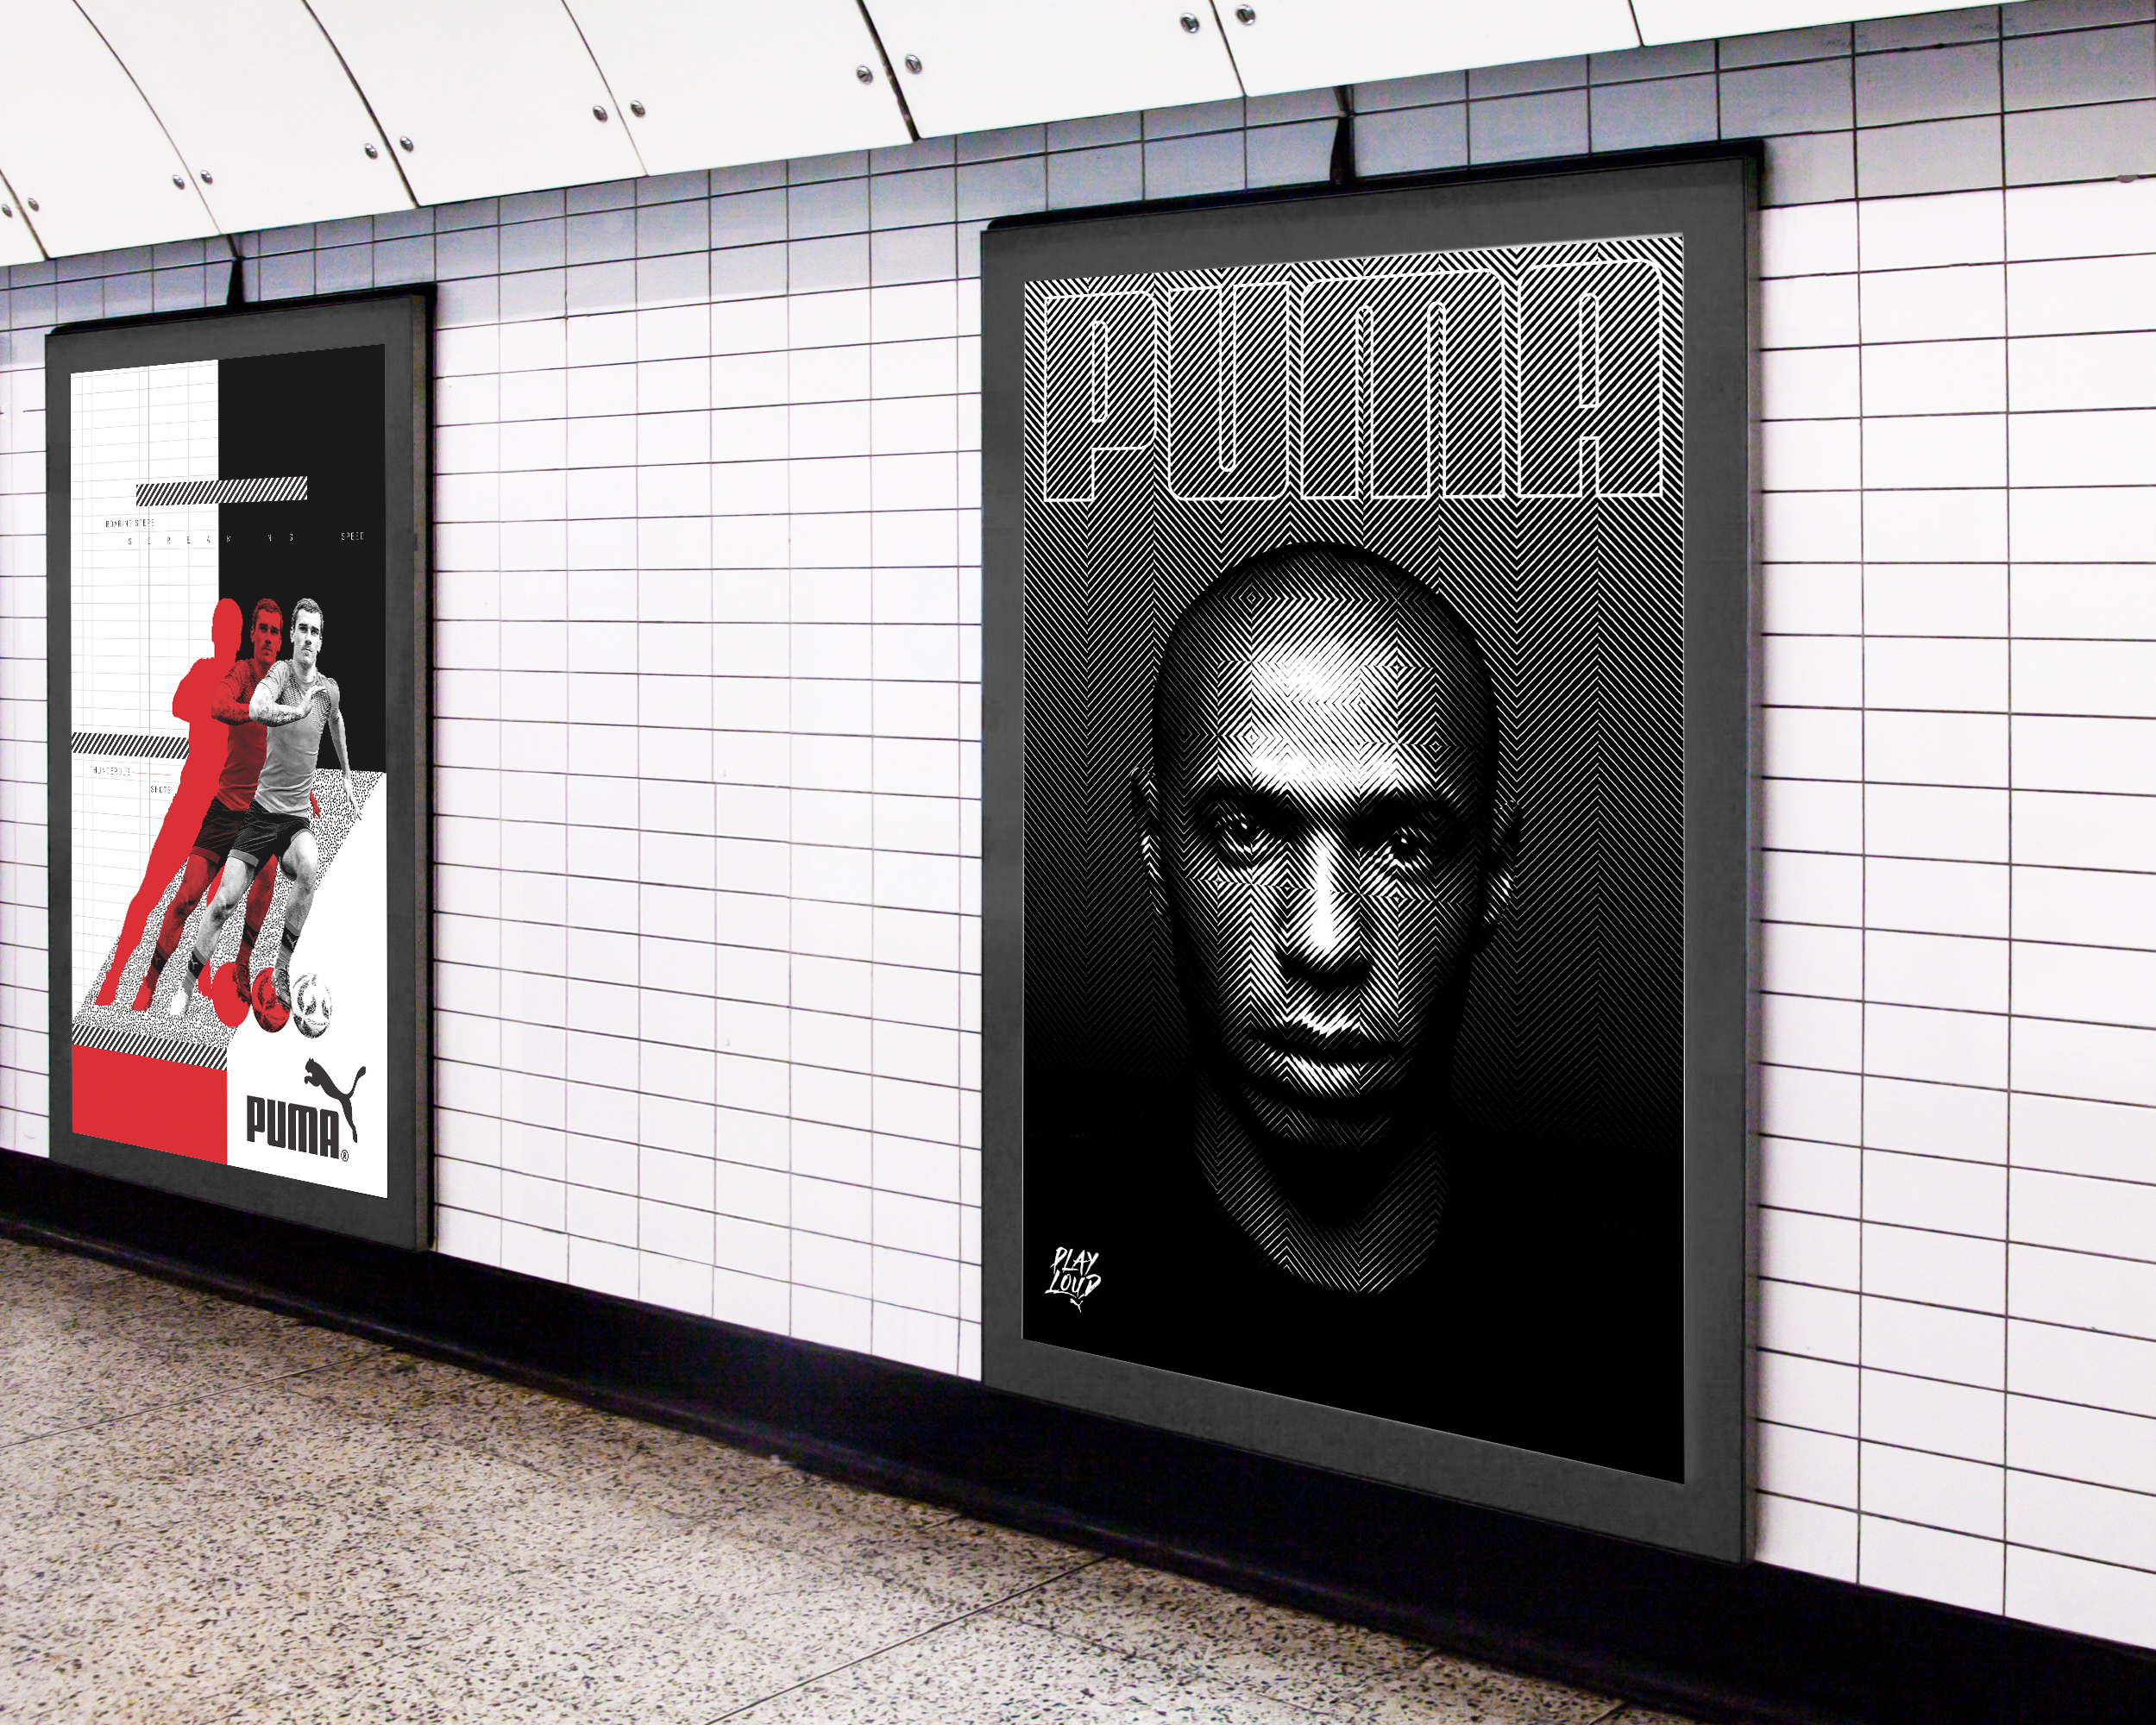 London_Underground_Ad_Screen_MockUp_1.jpg